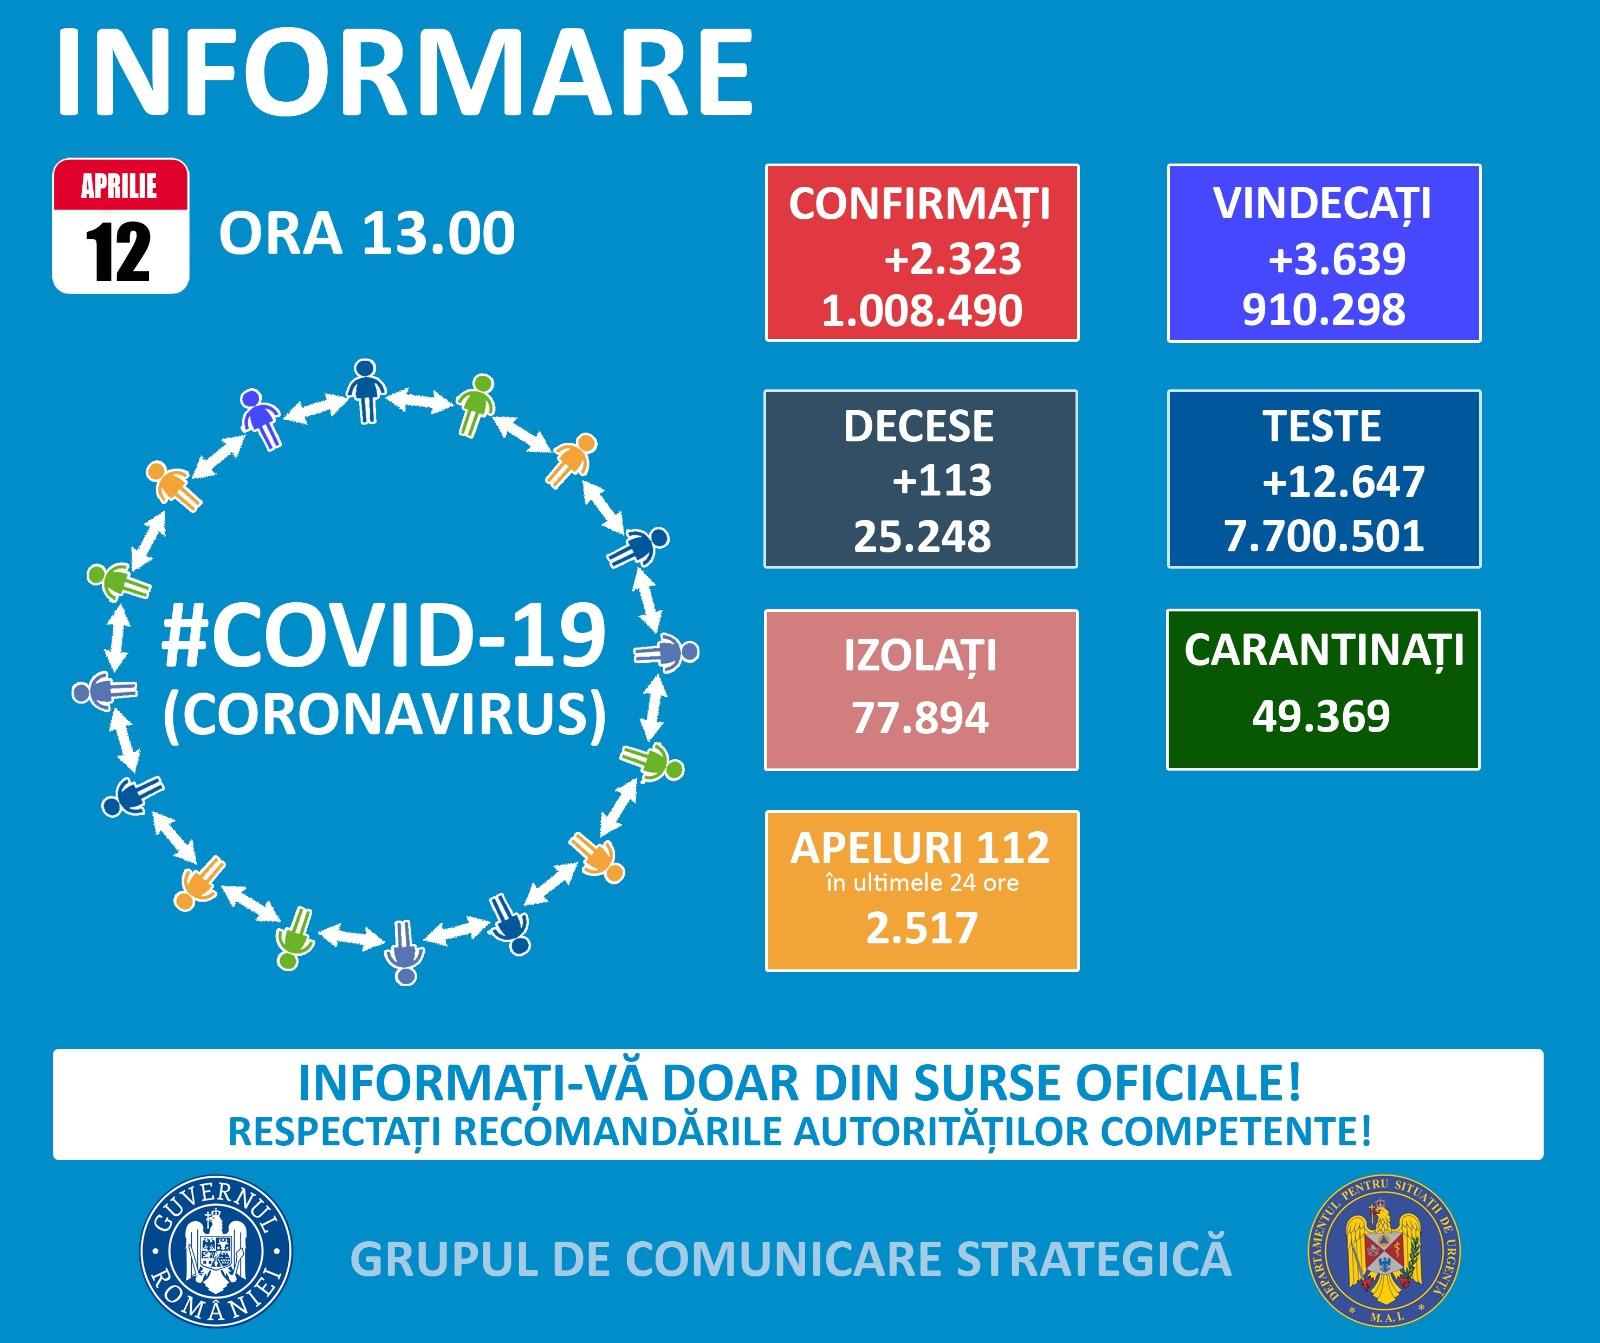 Informare COVID-19, 12 aprilie 2021